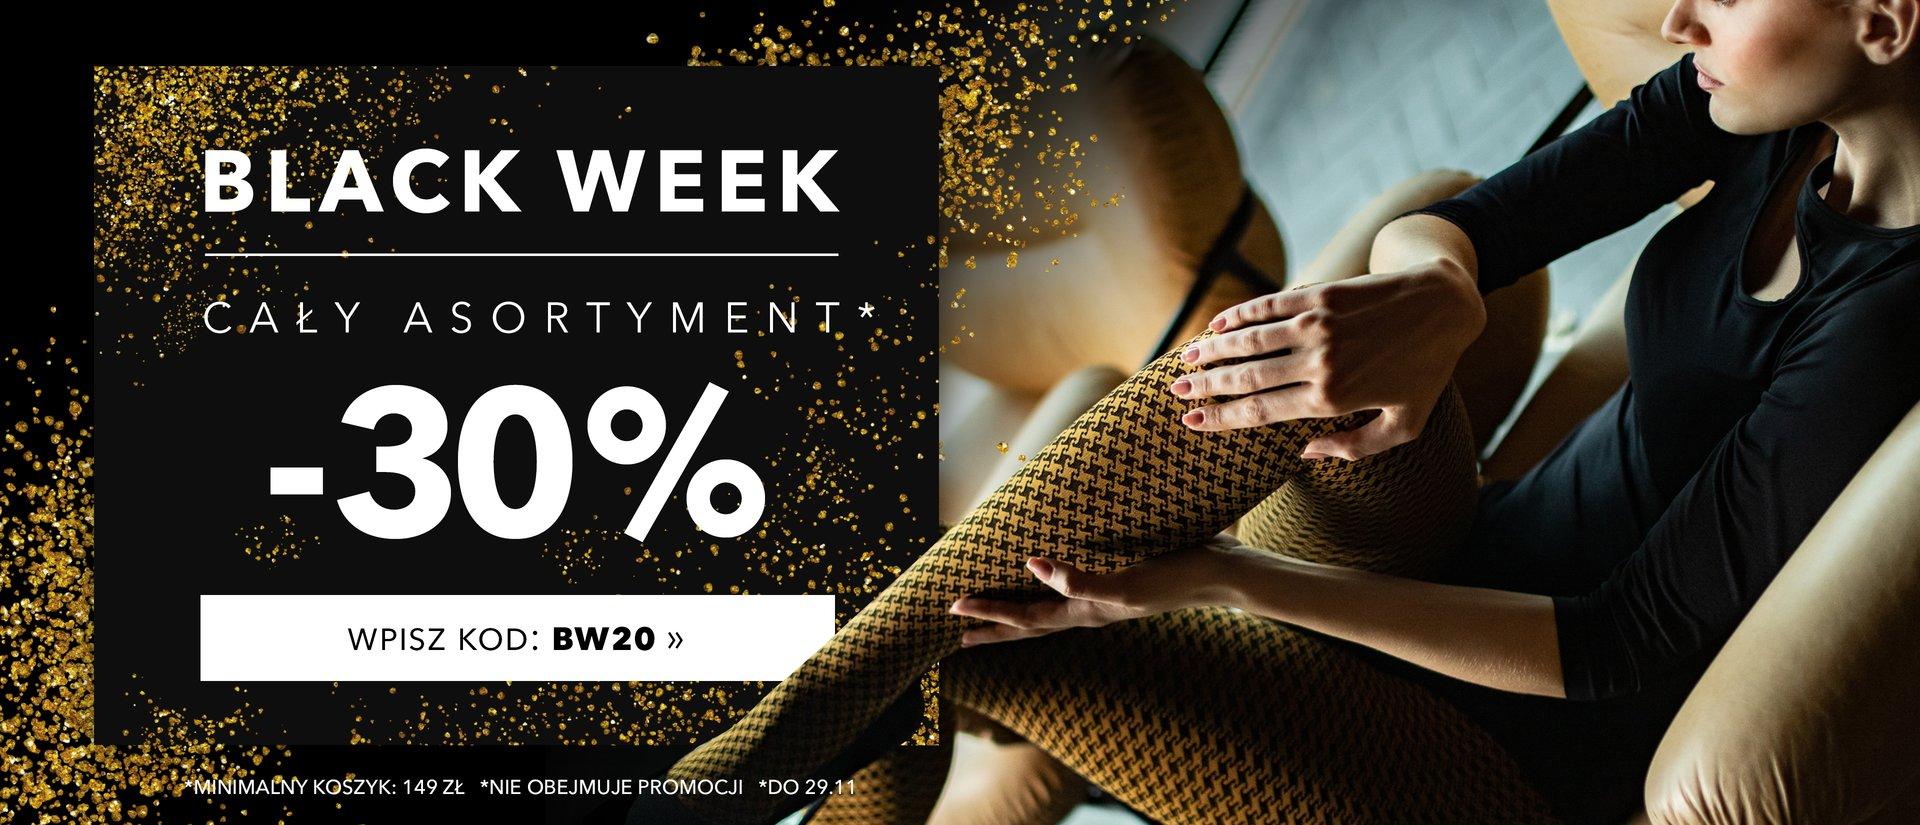 Gatta: Black Week 30% rabatu na cały asortyment